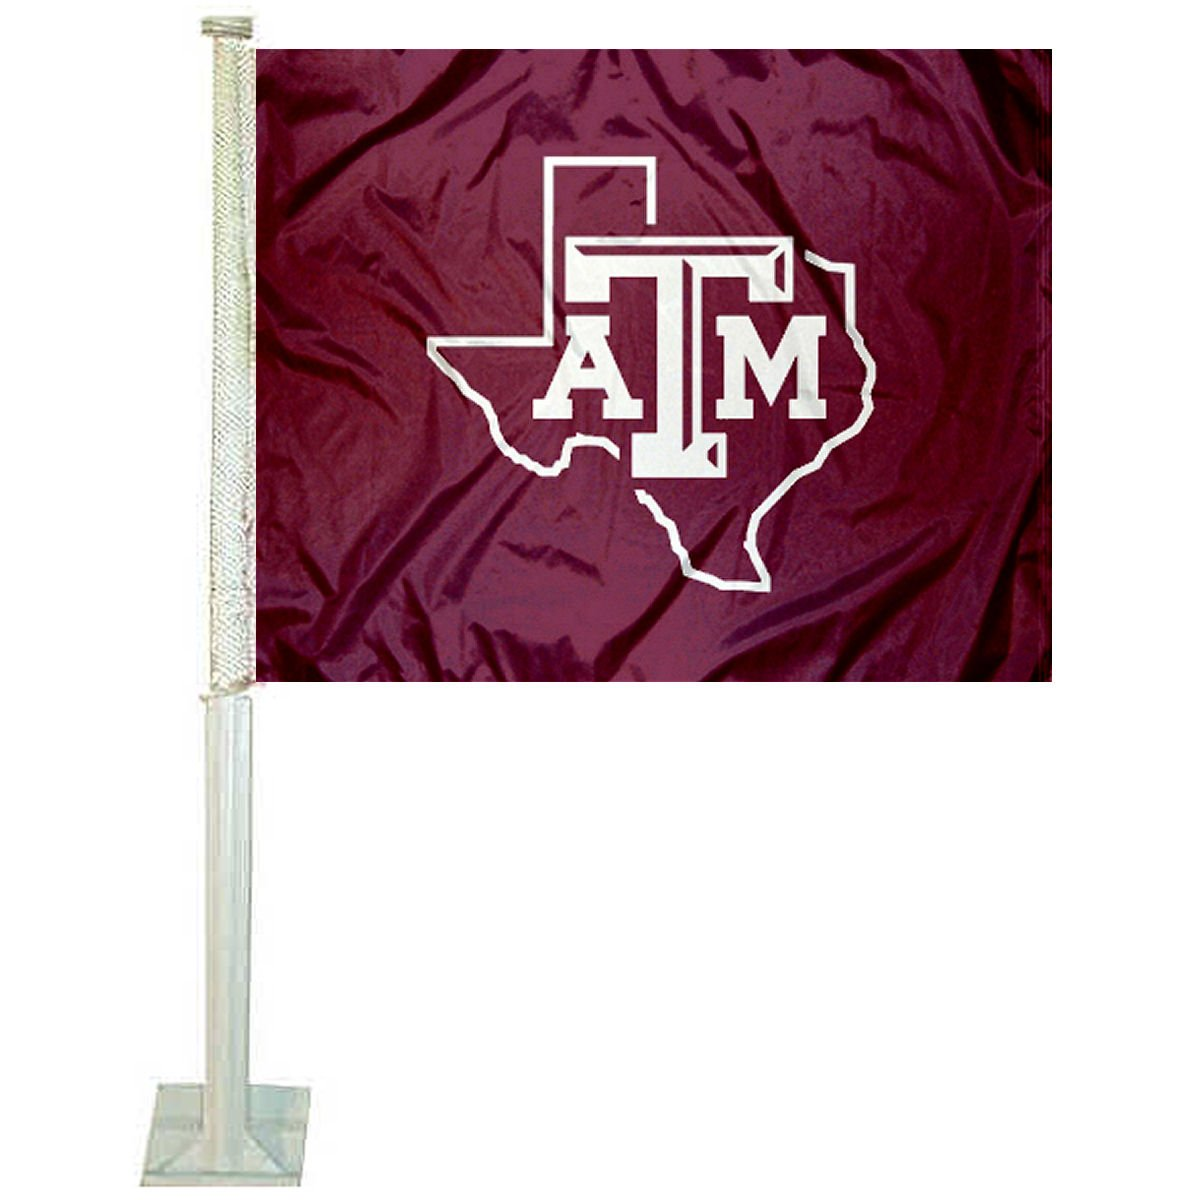 Texas A& M Aggies Lone Star Logo Car Flag College Flags and Banners Co.